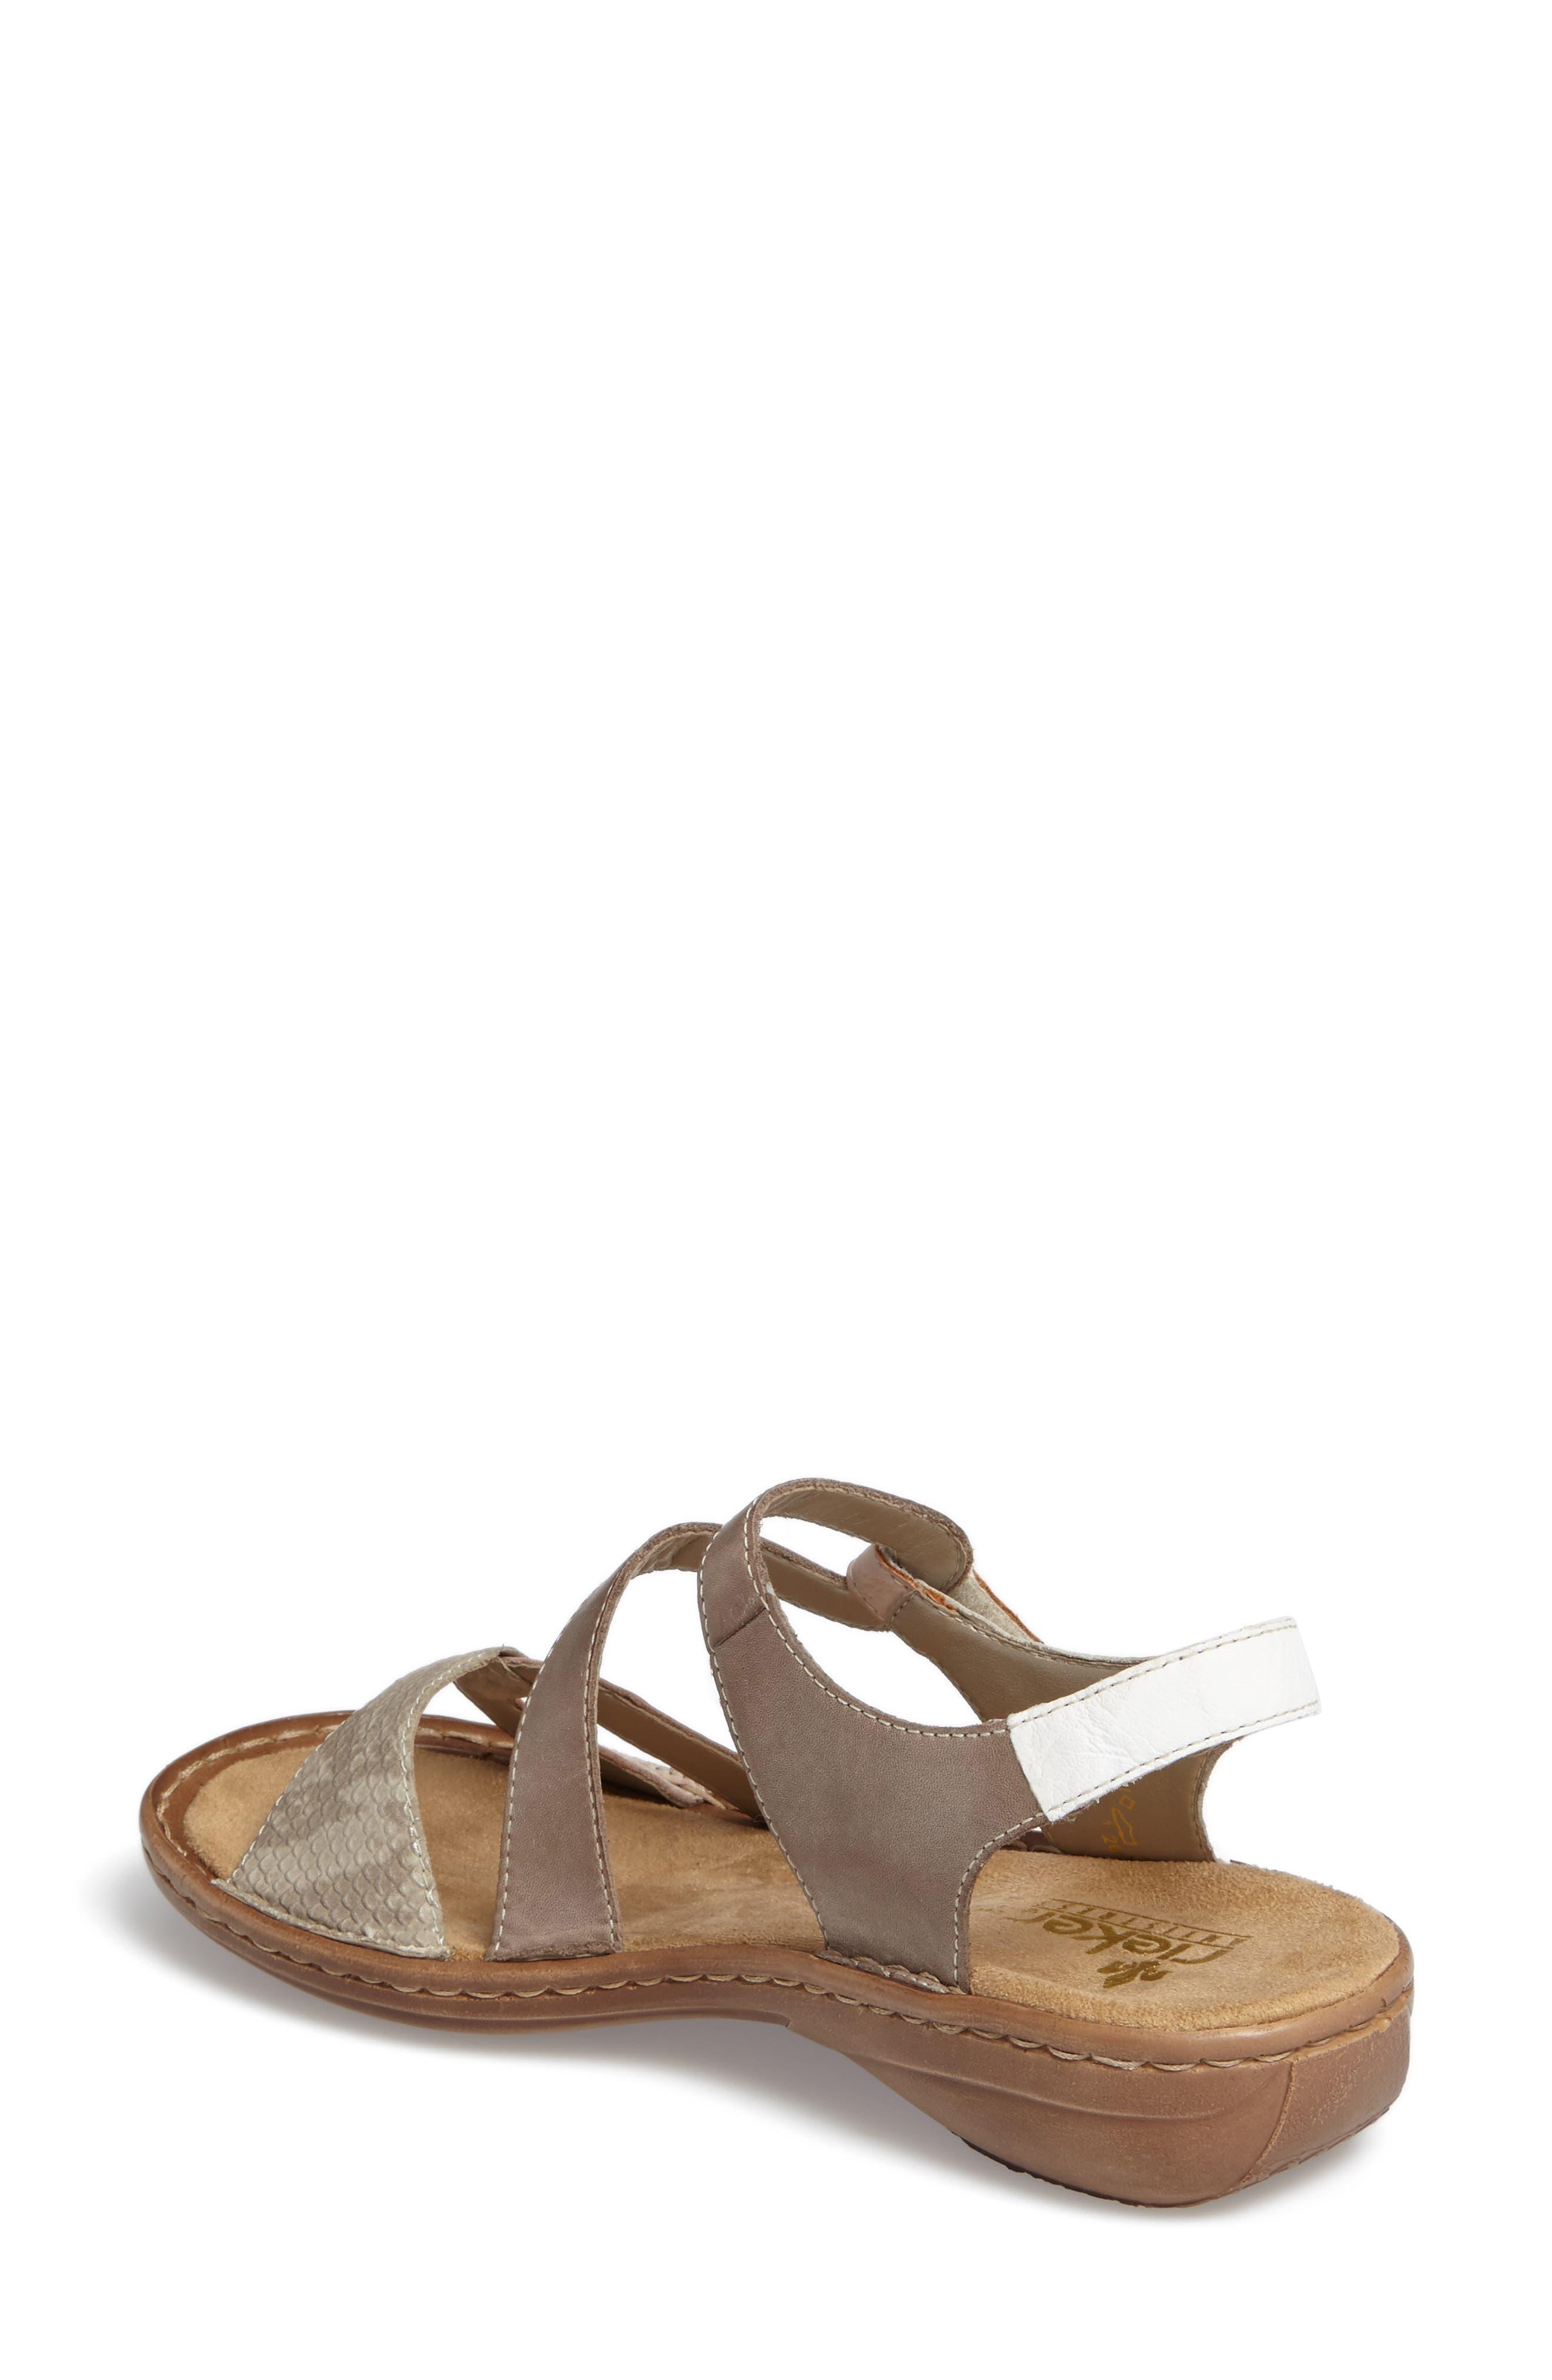 Regina 66 Wedge Sandal,                             Alternate thumbnail 2, color,                             Rose Leather